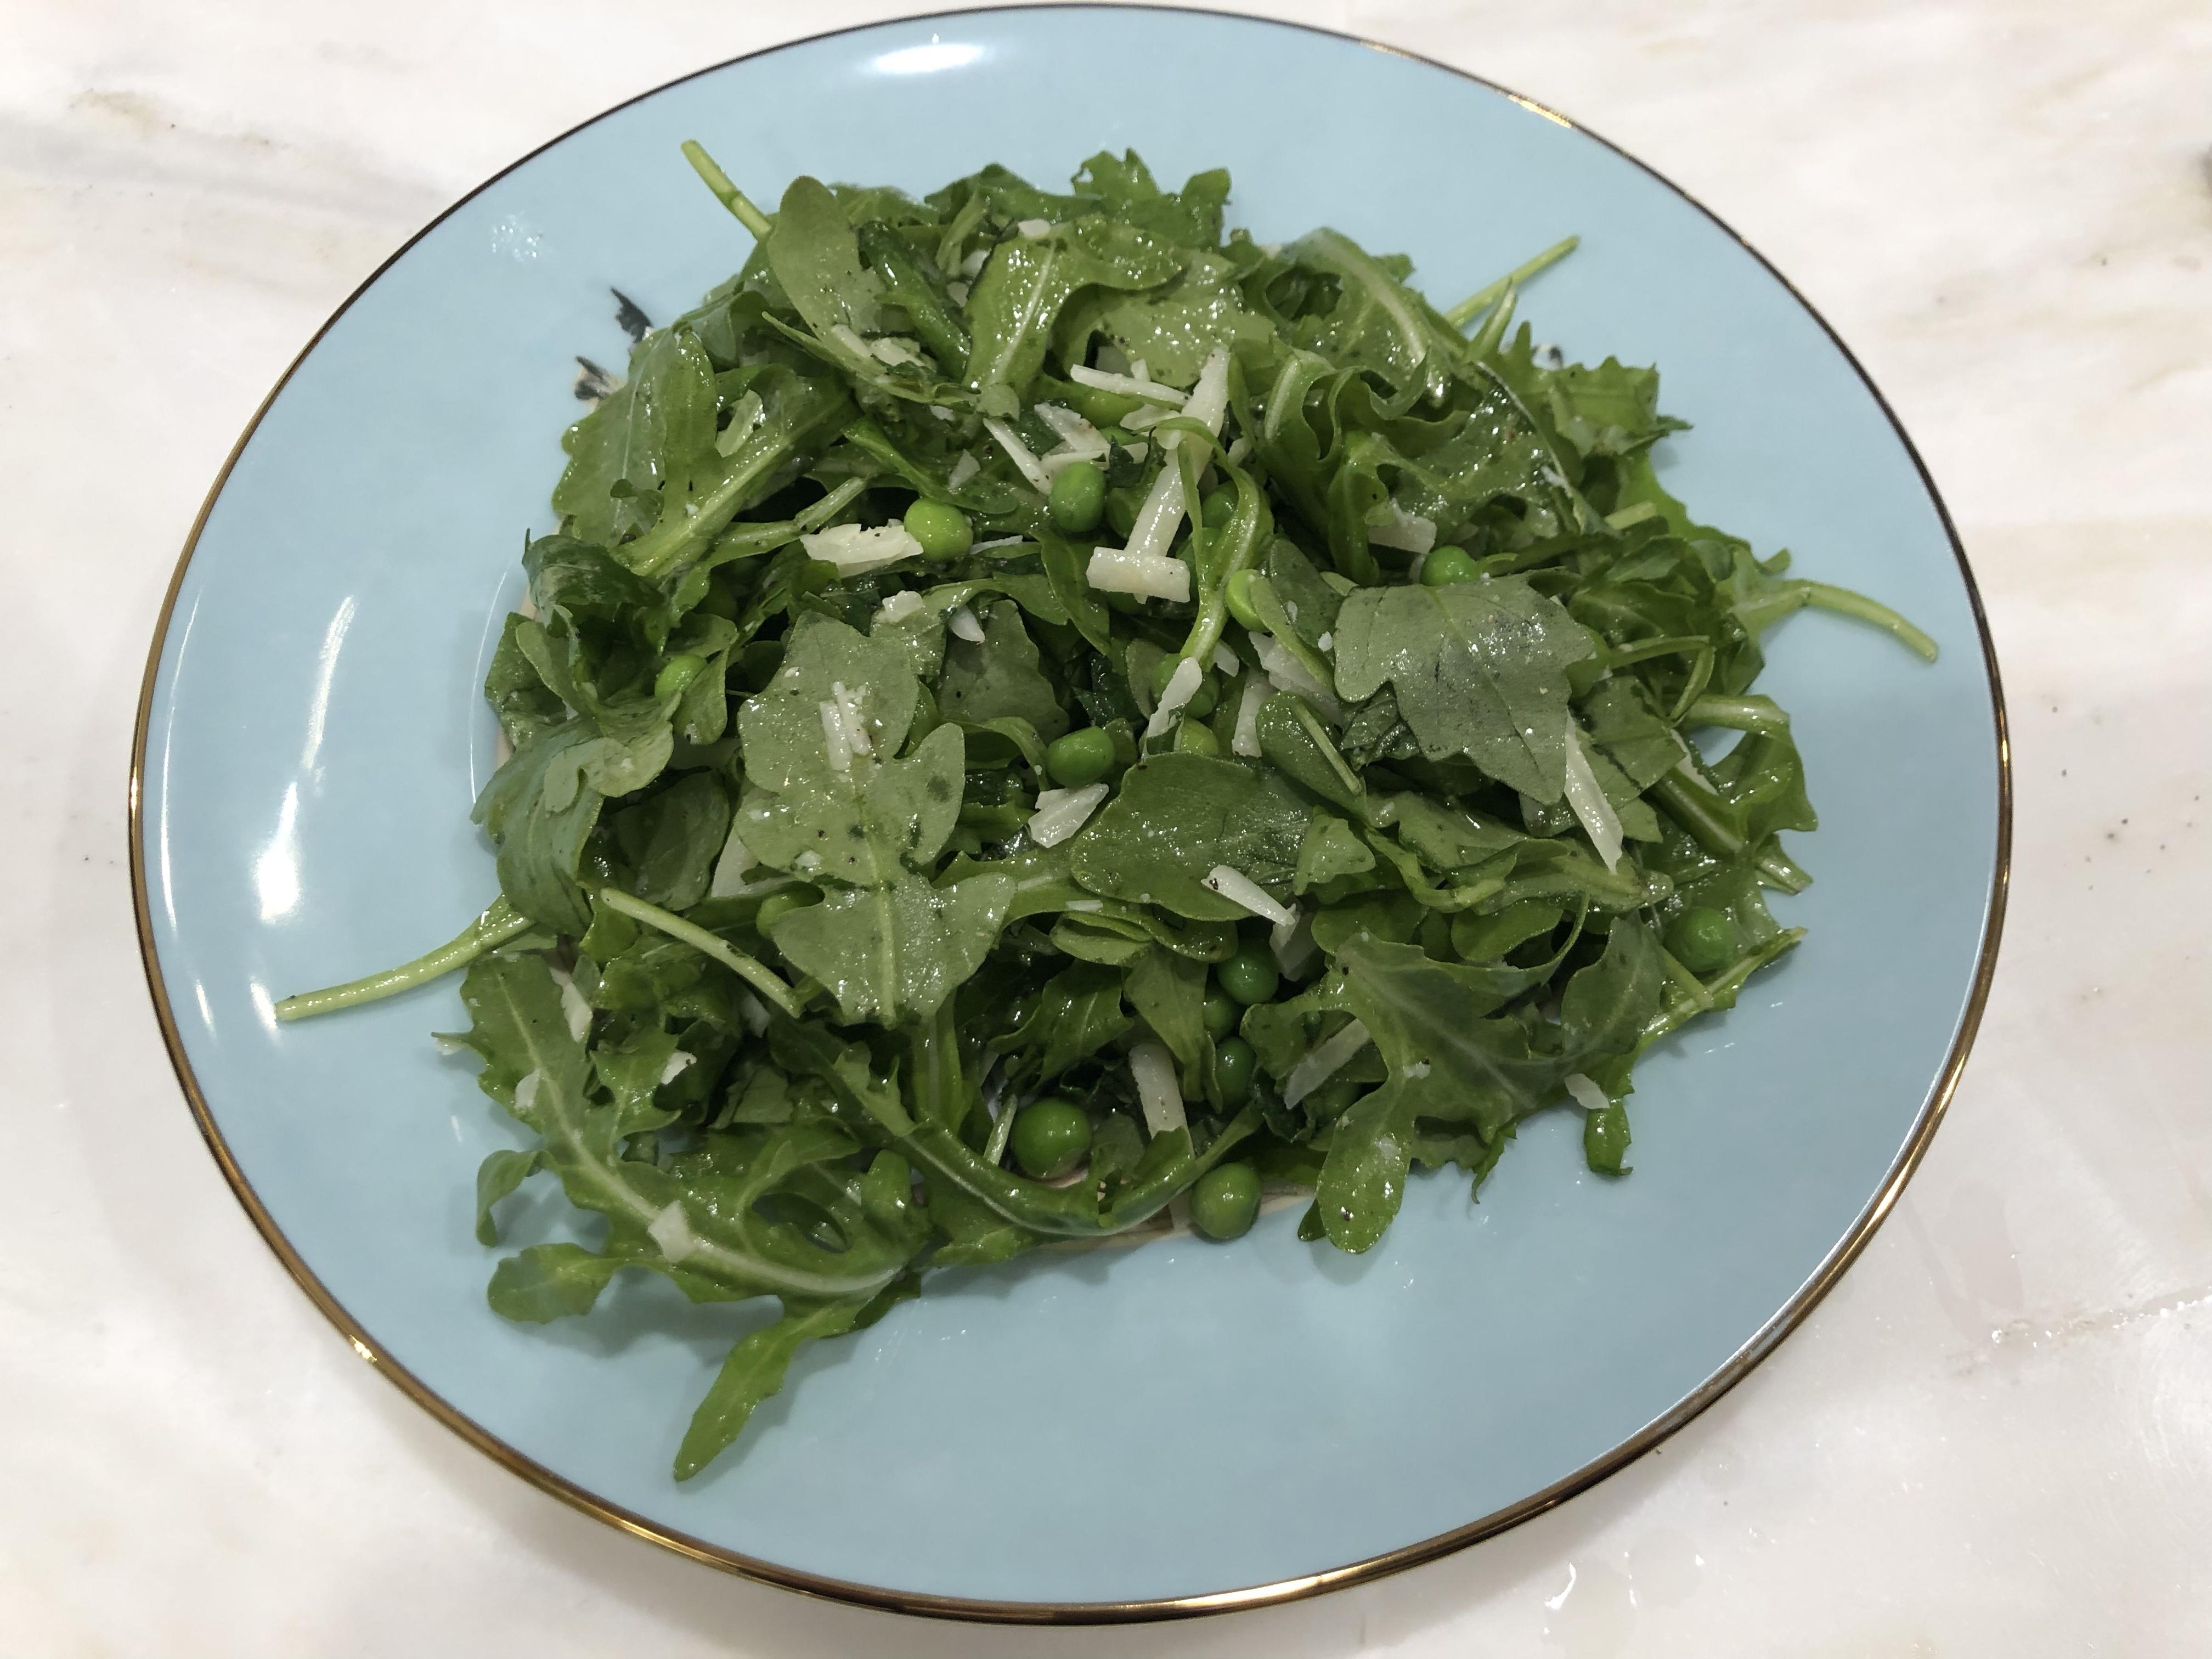 The WBS:  Arugula, pea & mint salad